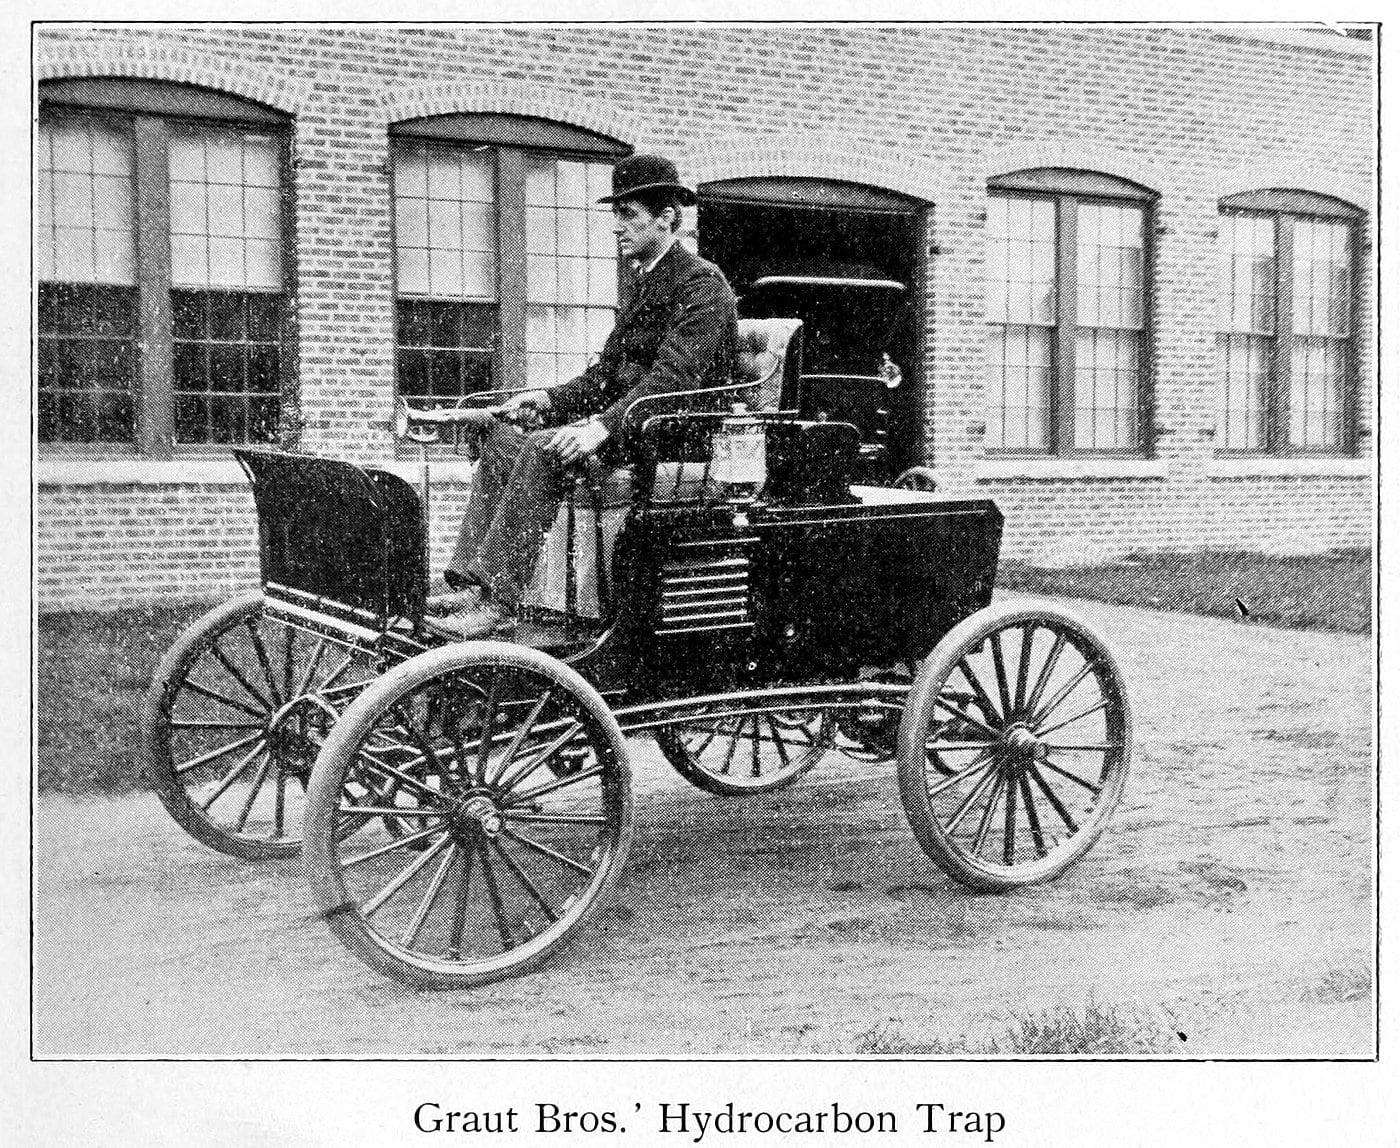 Graut Bros.' Hydrocarbon Trap (1899)